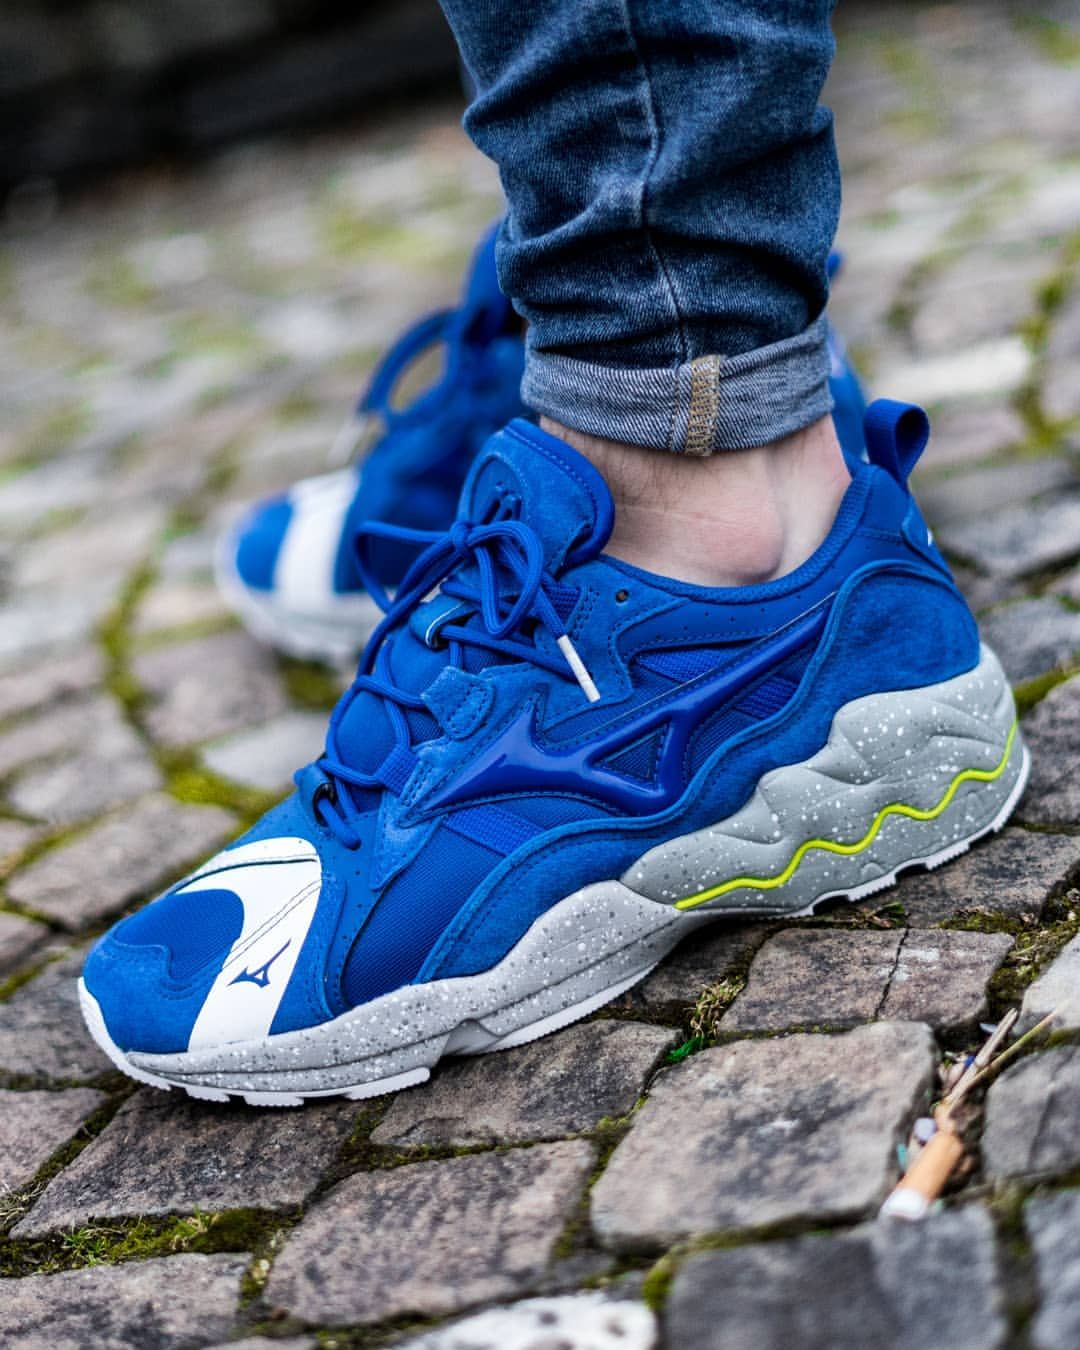 mizuno shoes size table feet mens denim